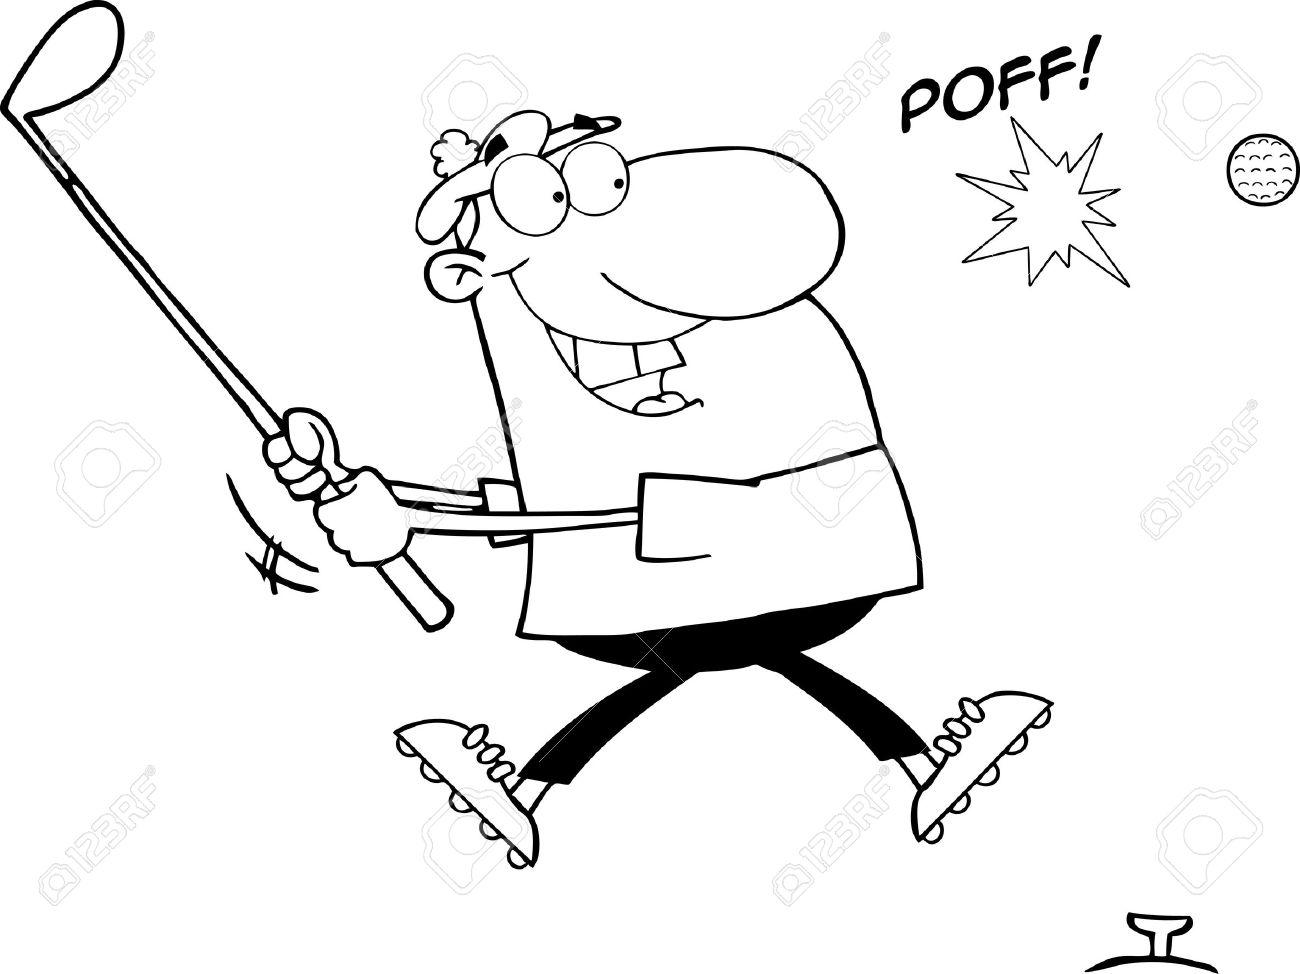 Outlined Male Golfer Hitting Golf Ball Stock Vector - 12775339